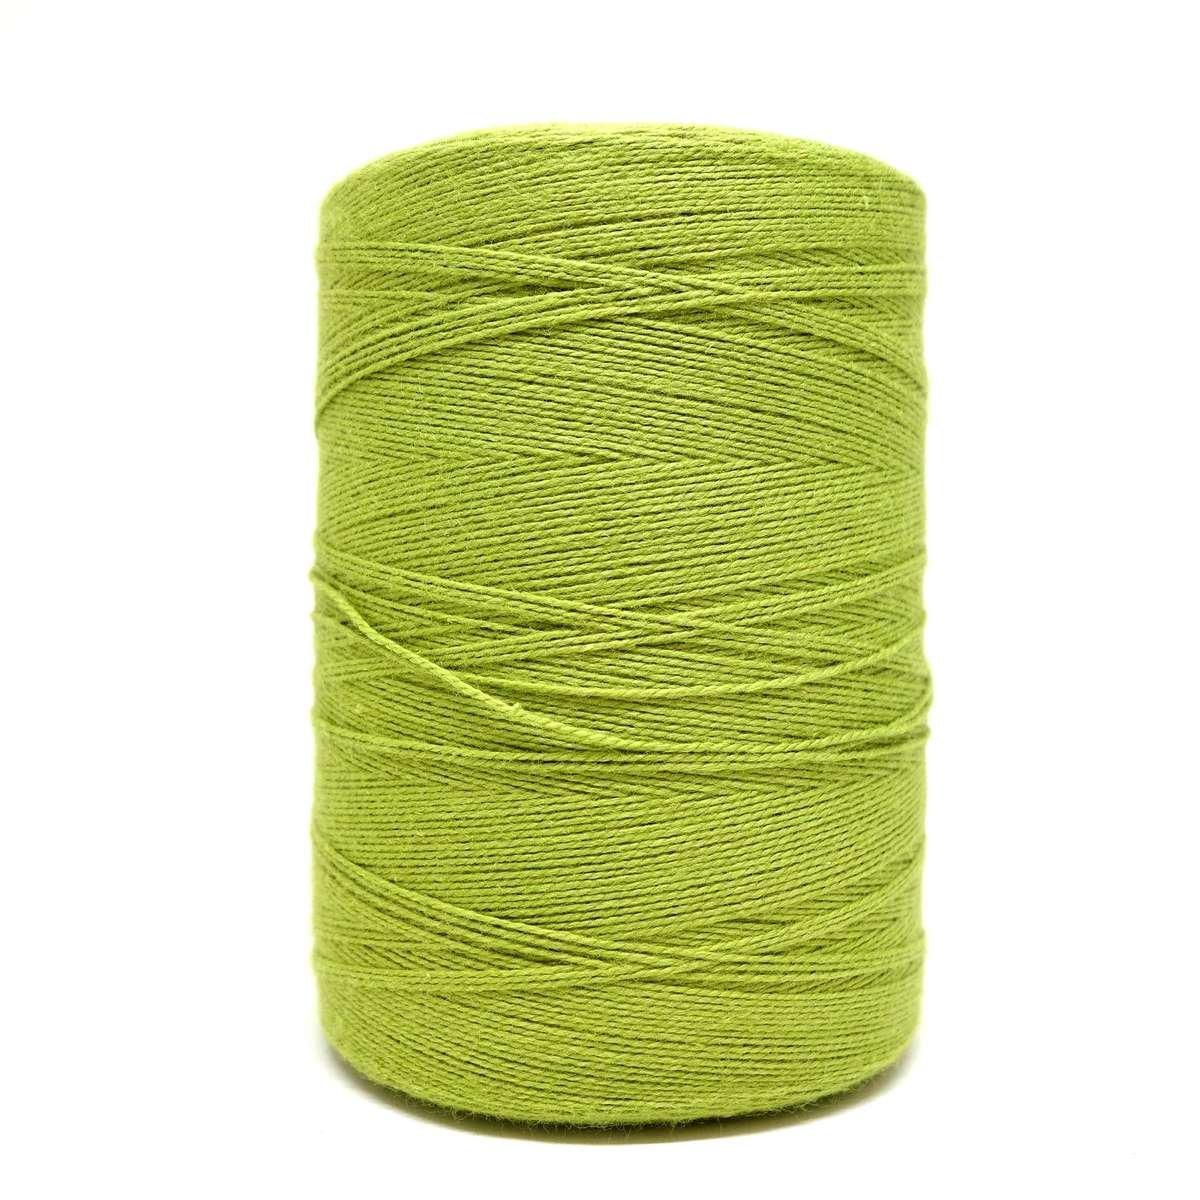 Cotton Yarn for Weavers – GIST: Yarn & Fiber